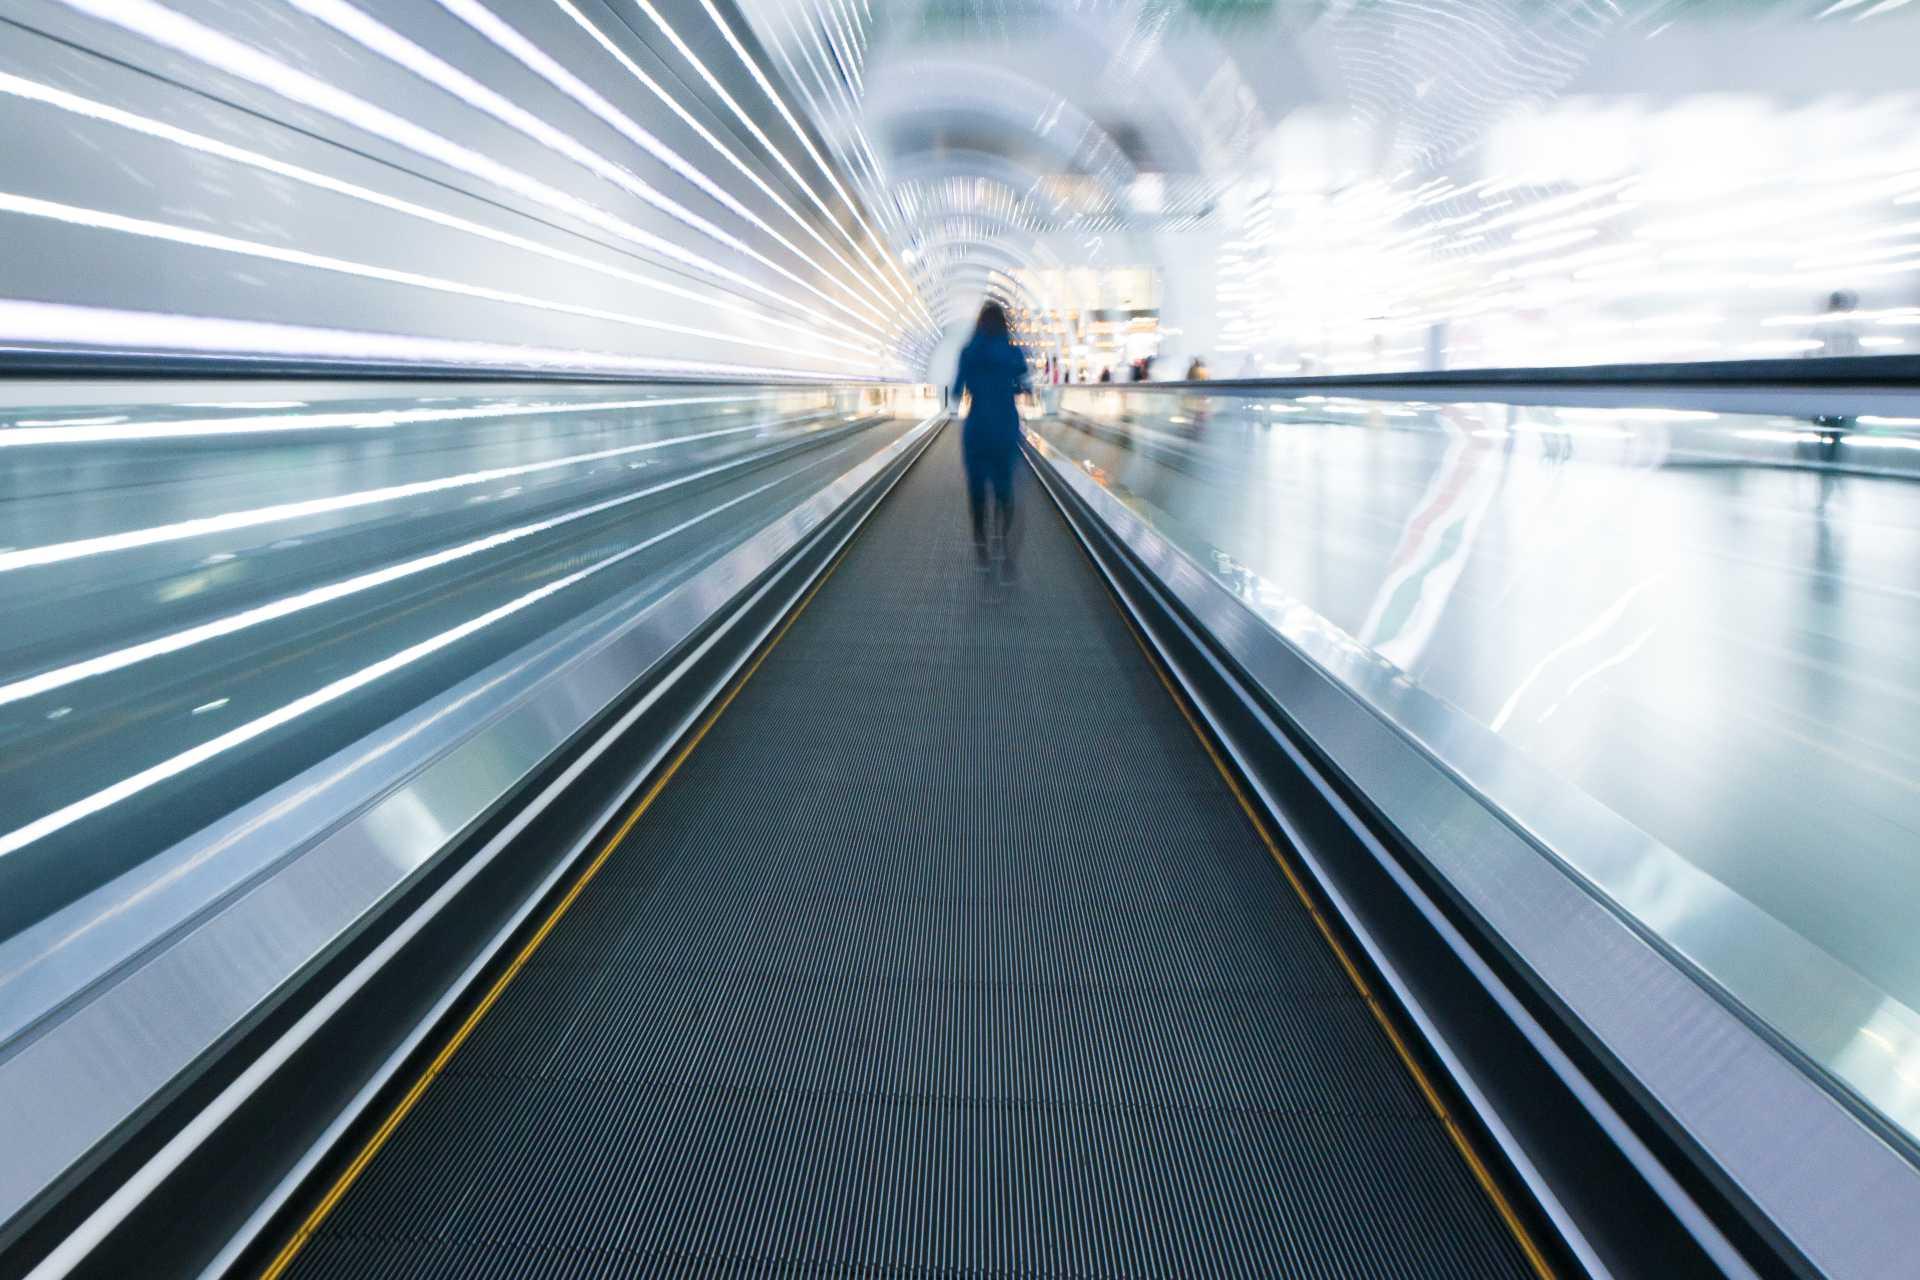 Woman in high tech walkway